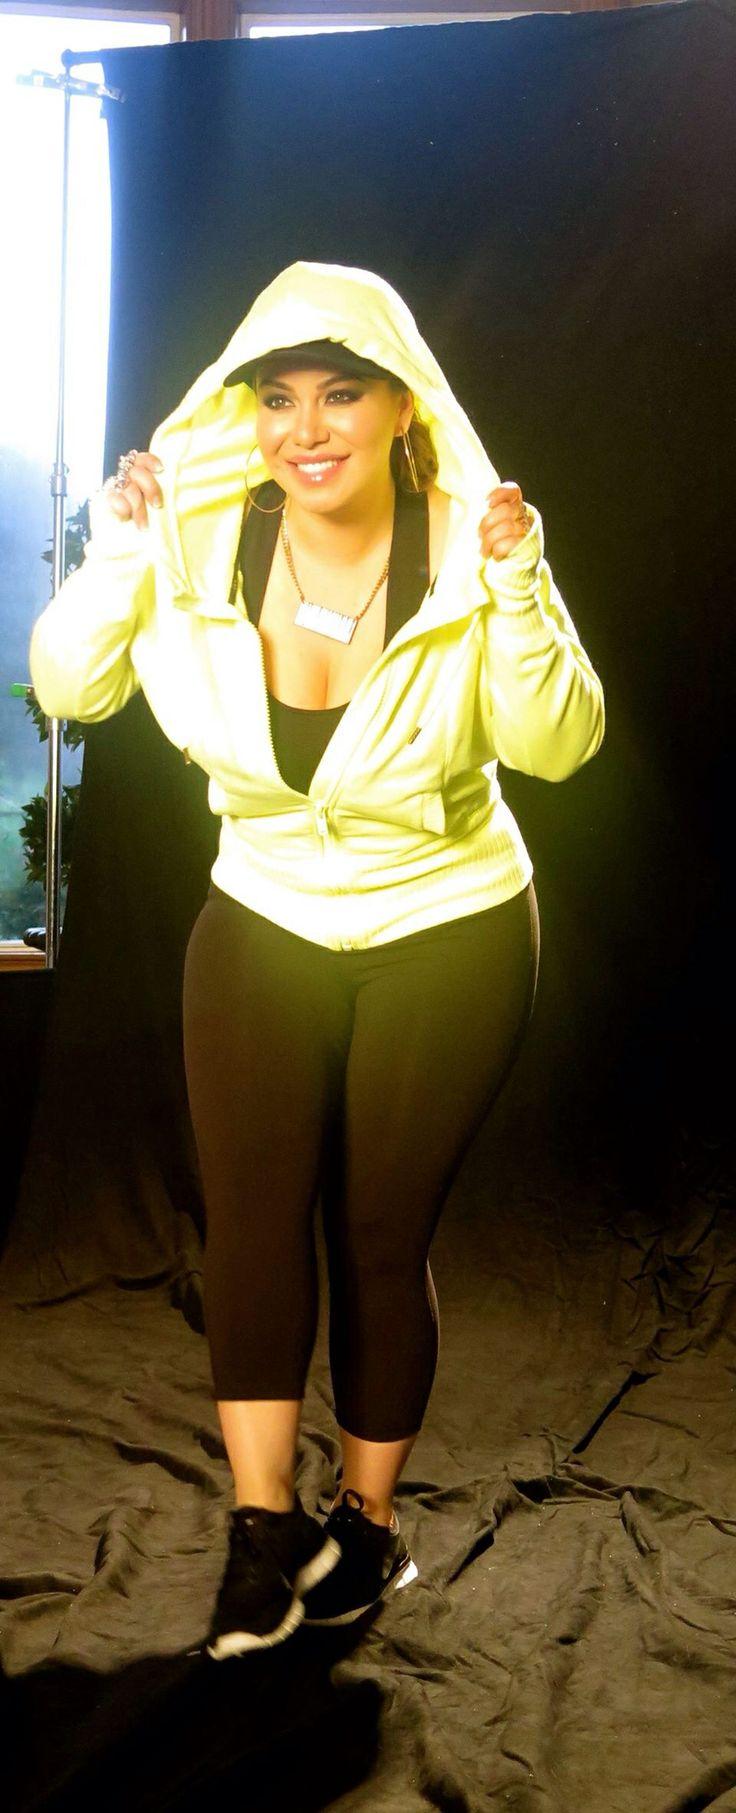 Jenni Rivera Tits Best 432 best sexy images on pinterest | salma hayek, beautiful